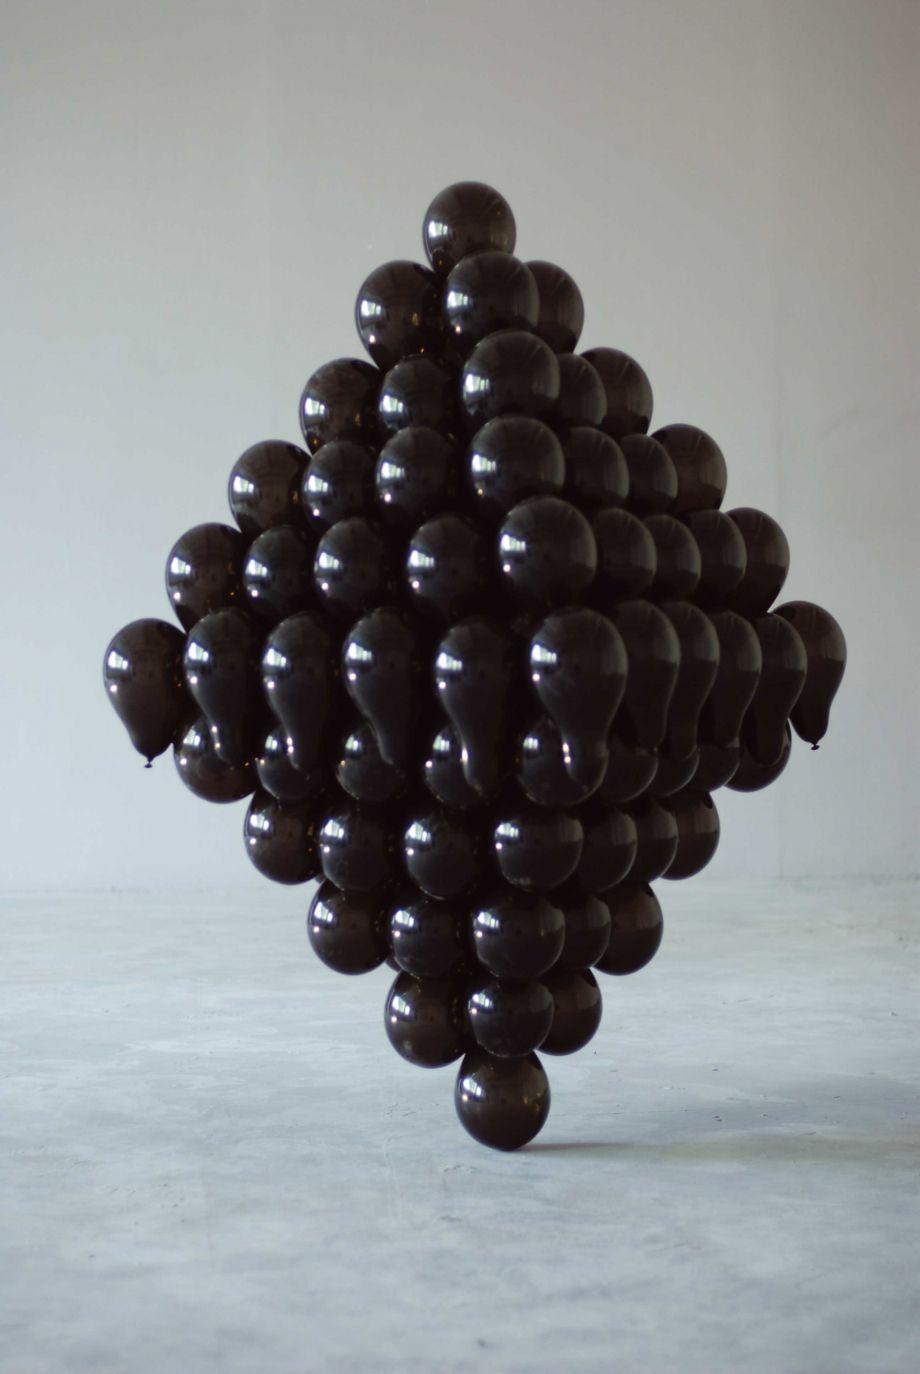 David Stearn Balloon Black Installation Geometric